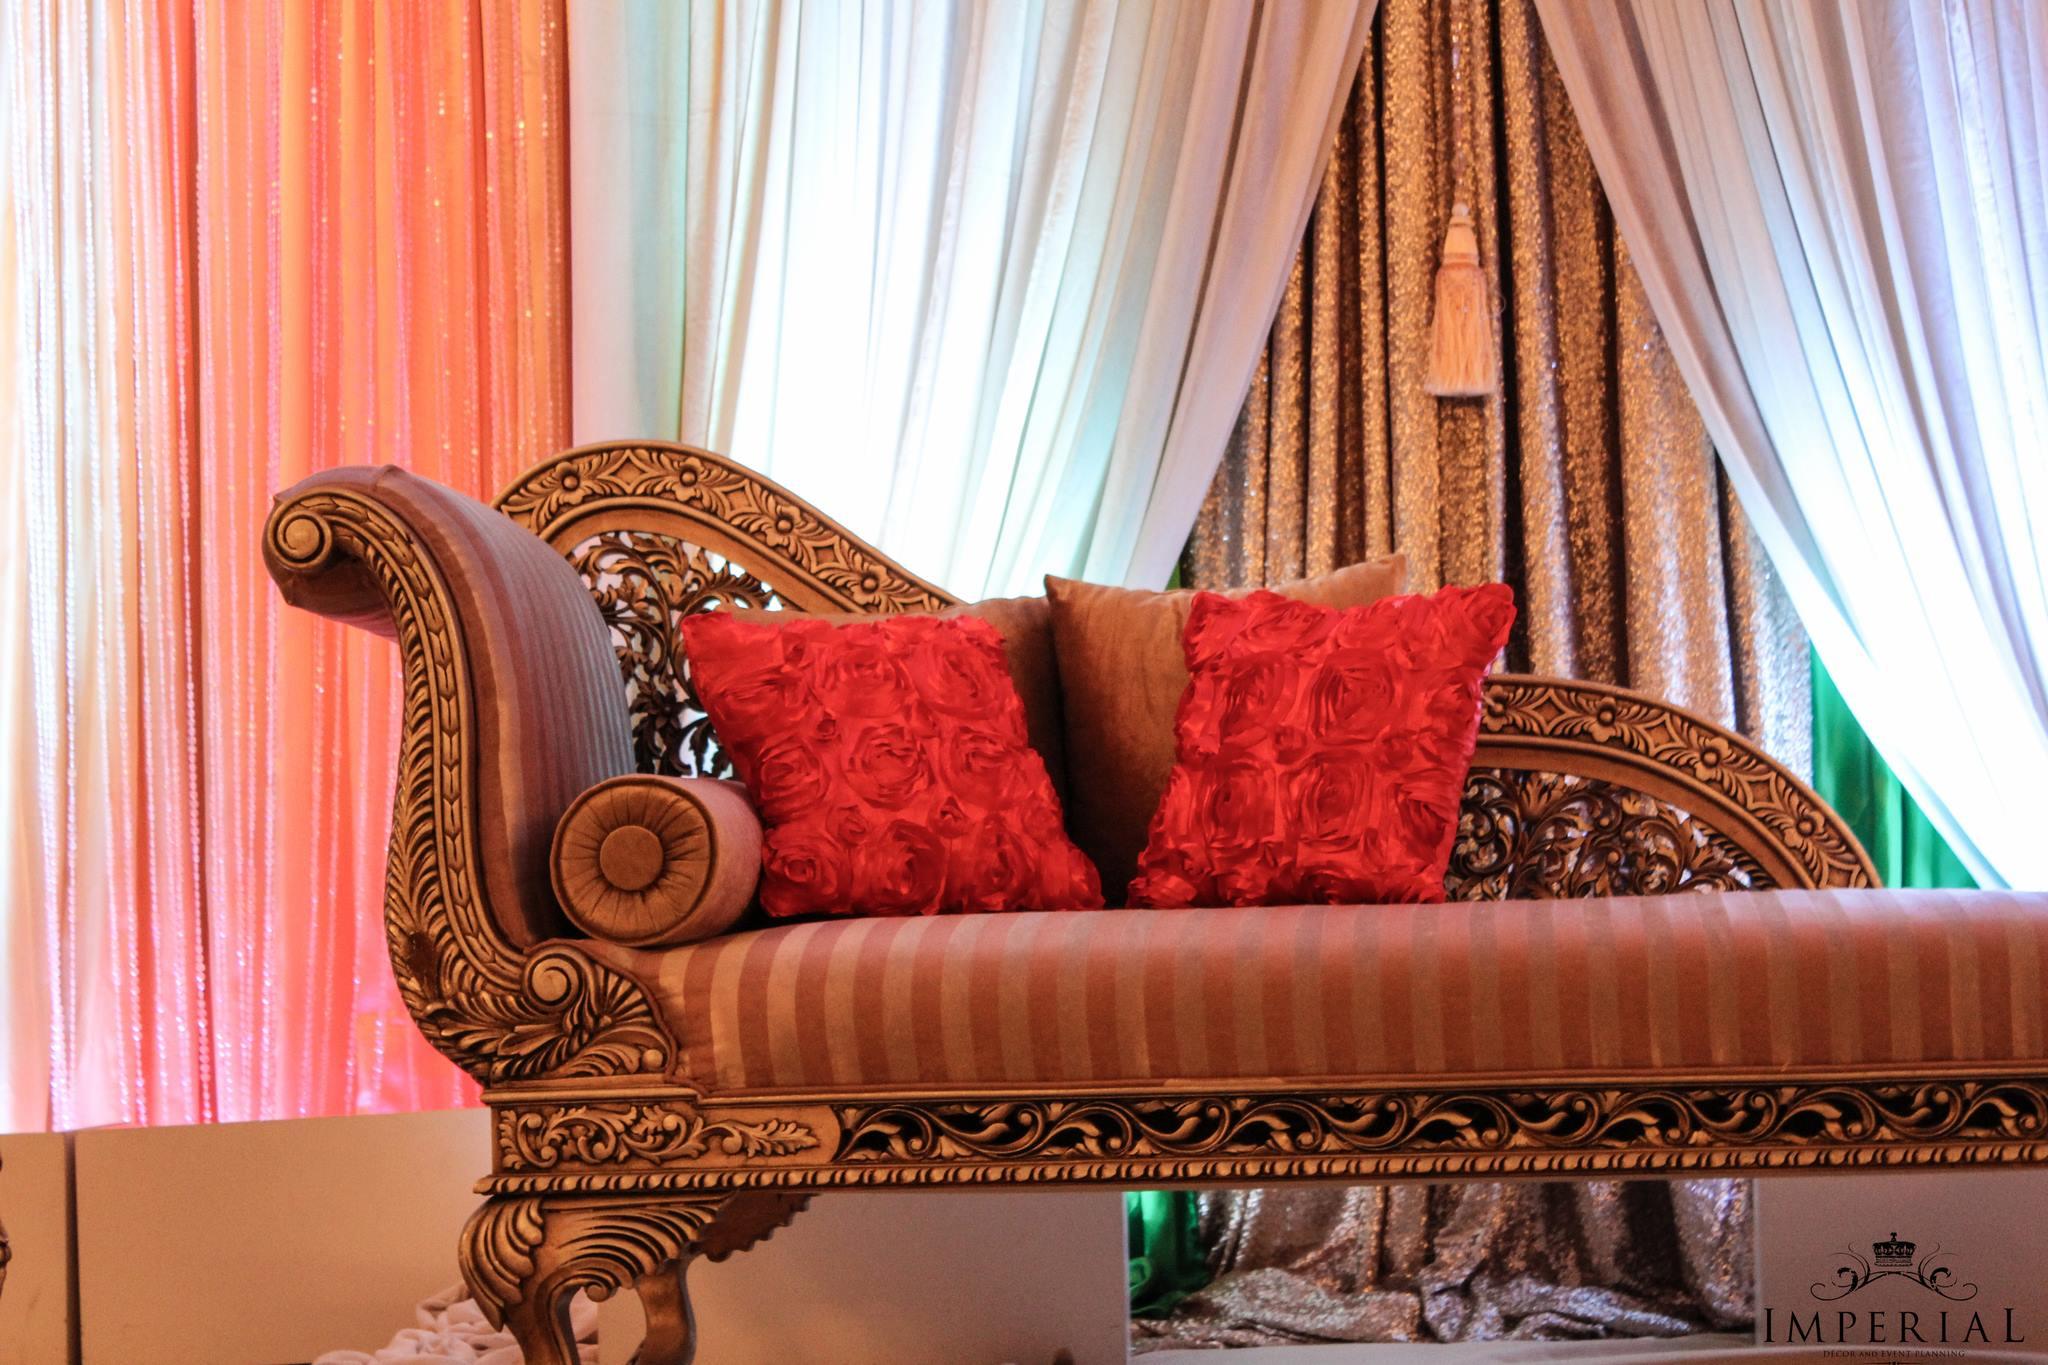 Imperial Decoration - Pakistan Wedding Stage Decorations.jpg